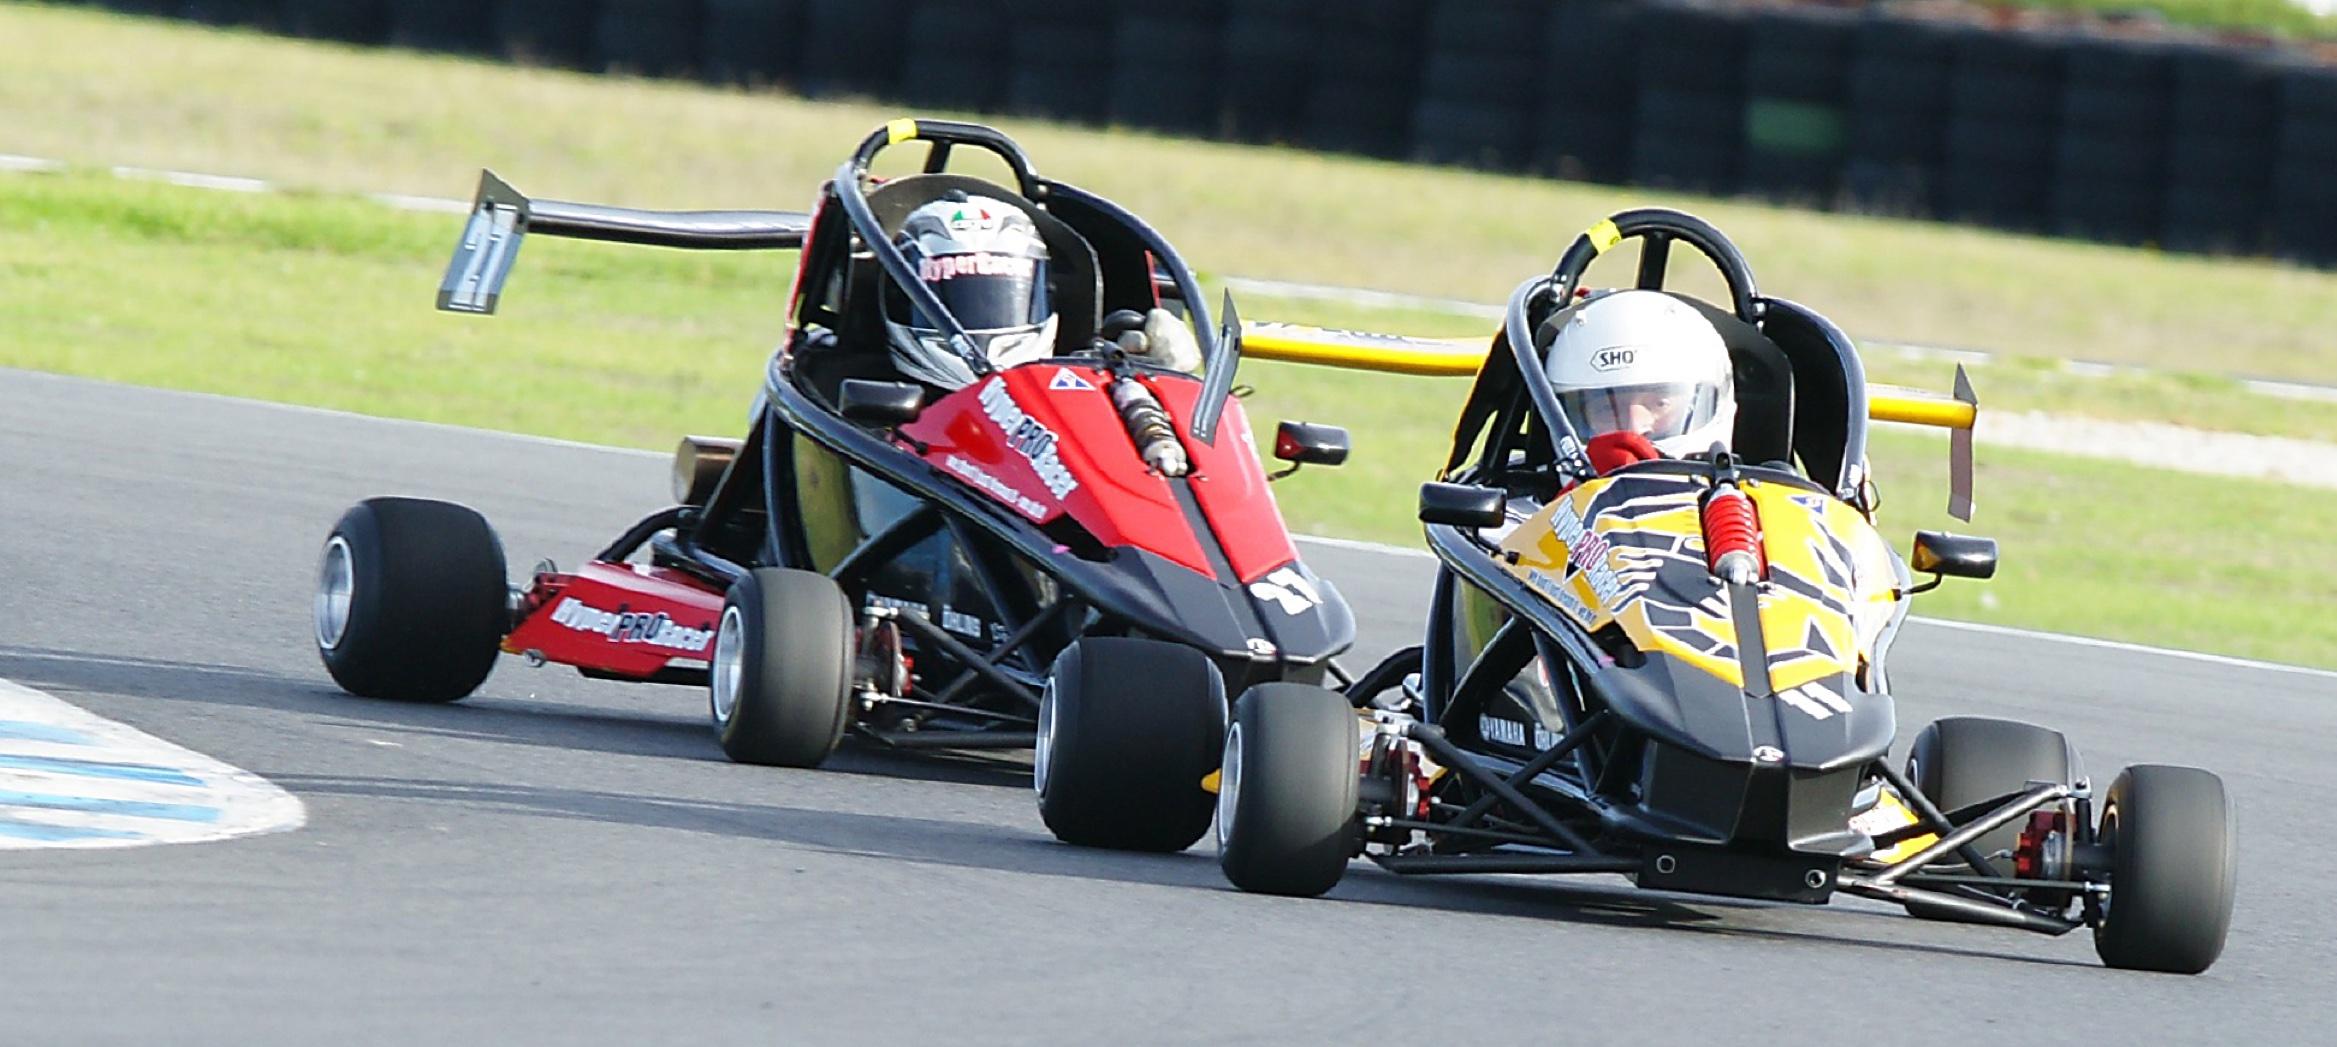 Racingcars